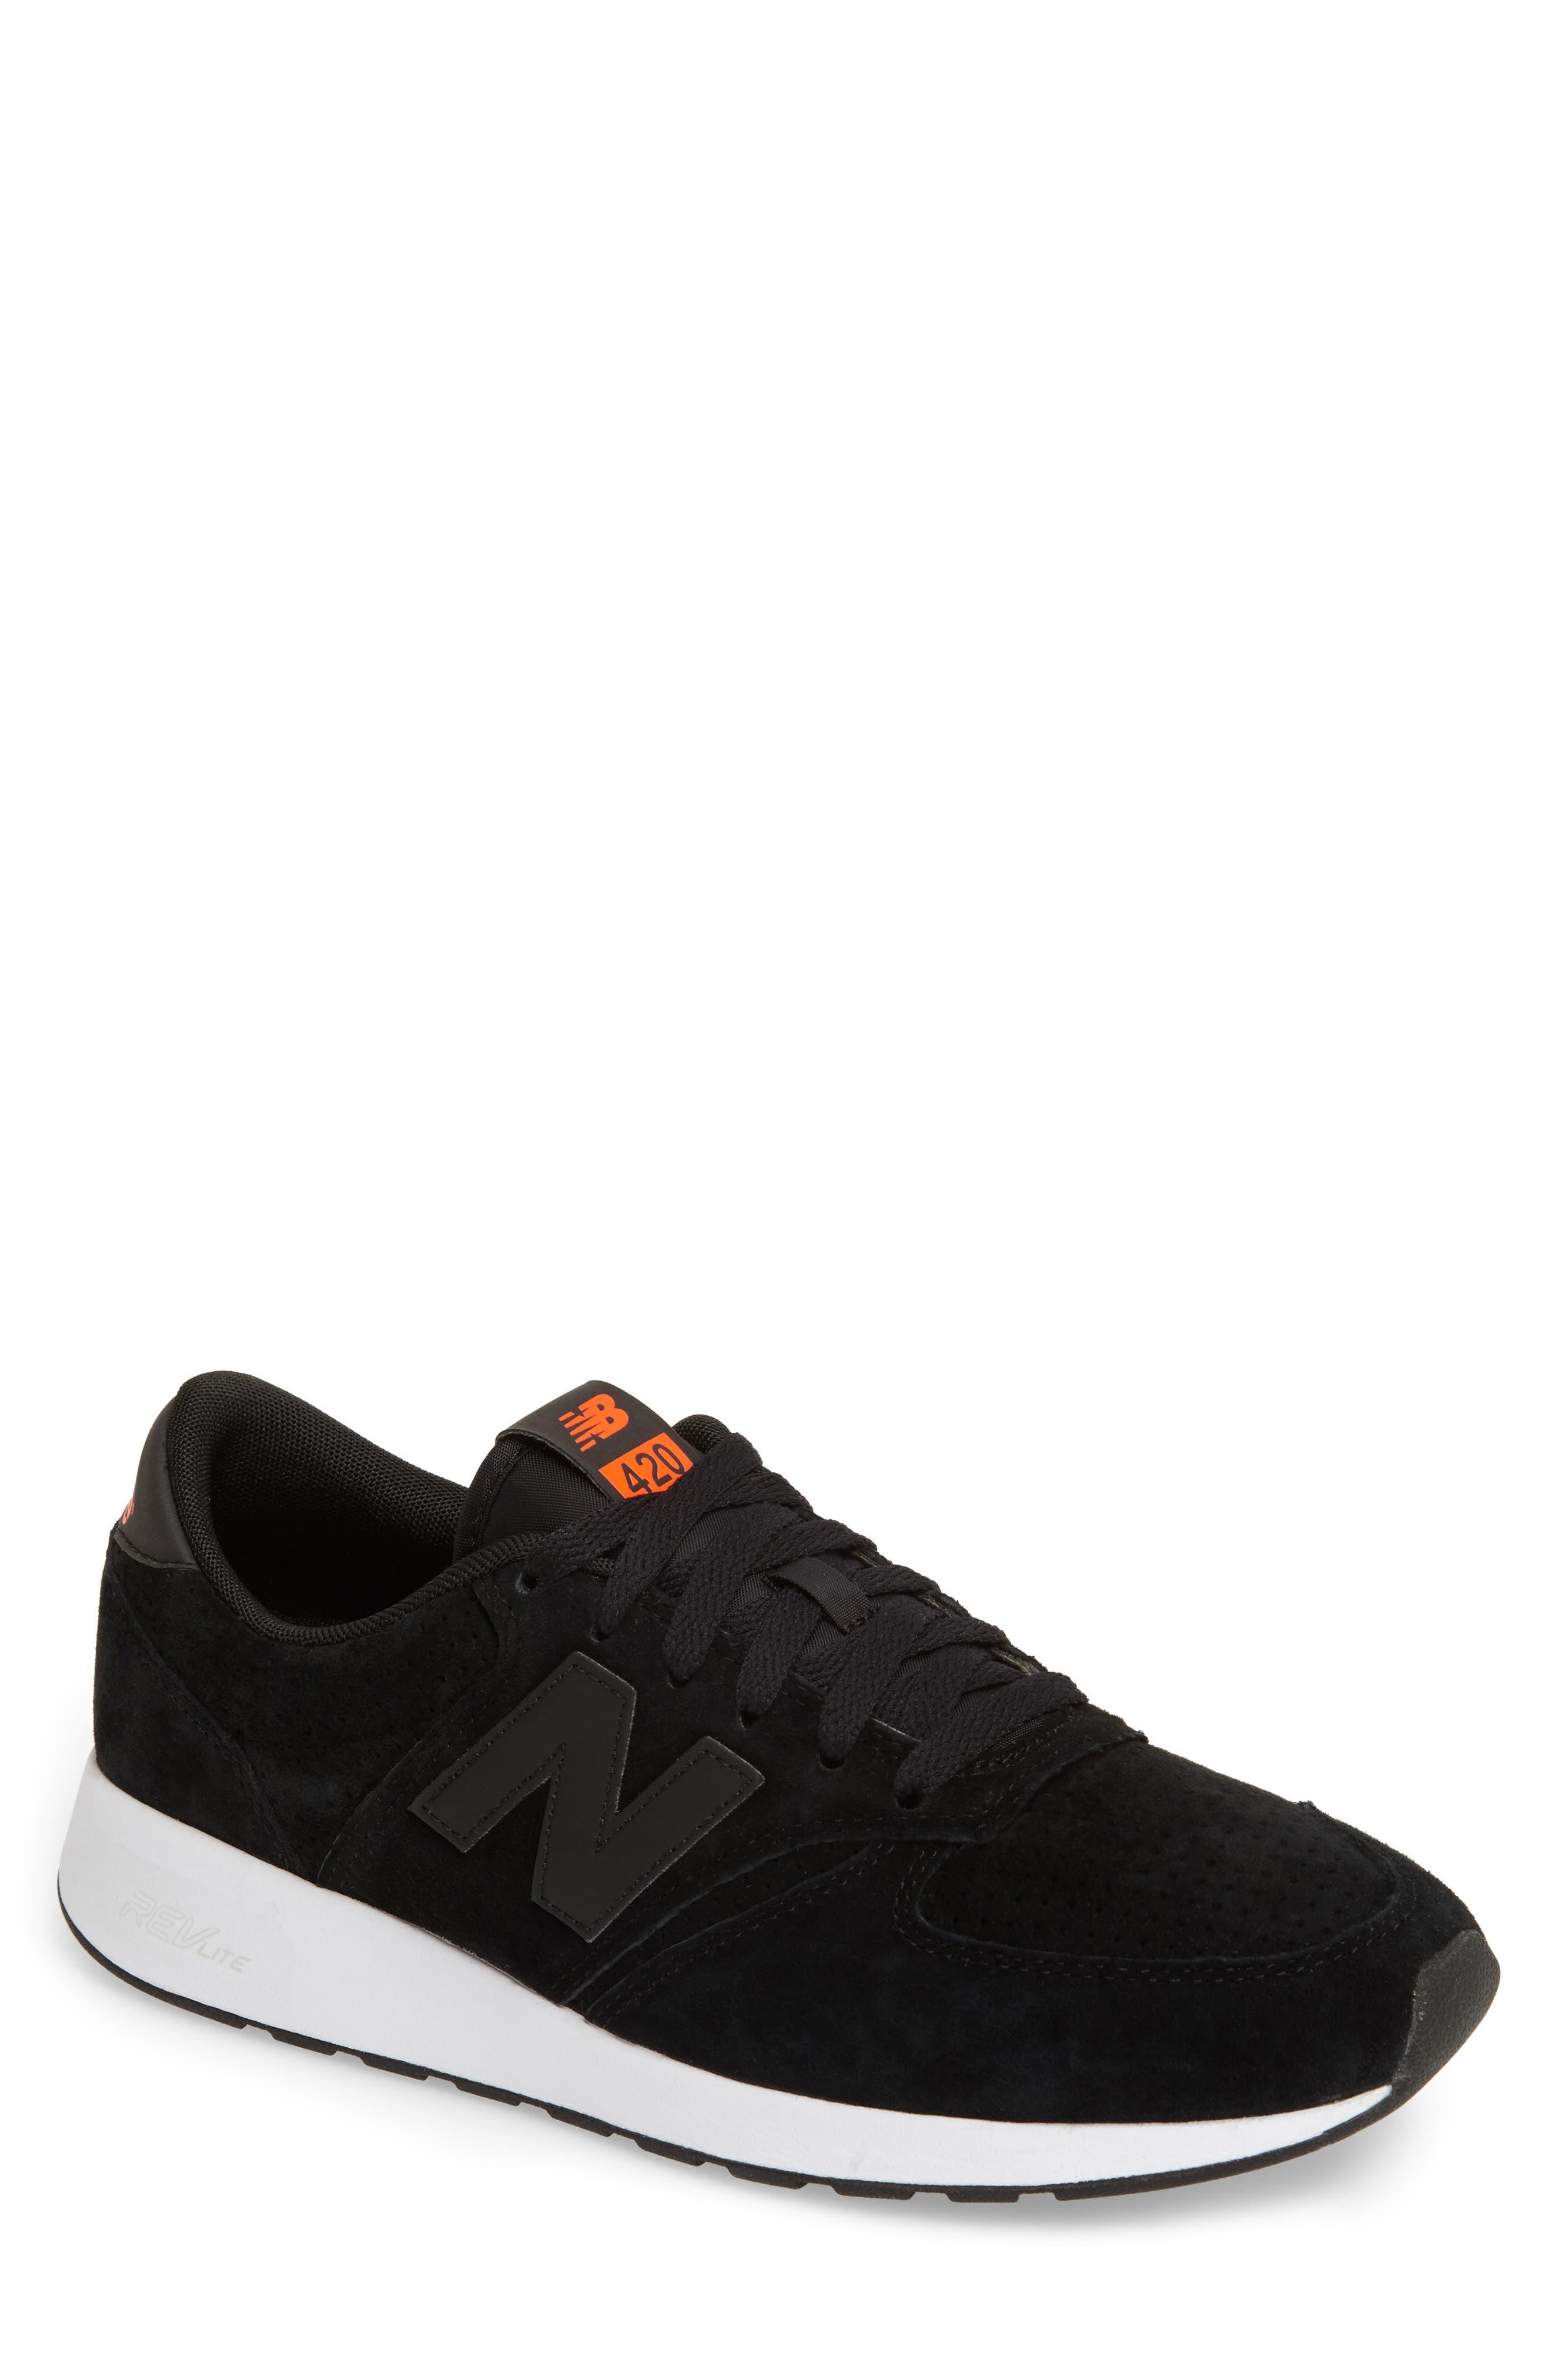 New Balance 420 Sneaker (Men)